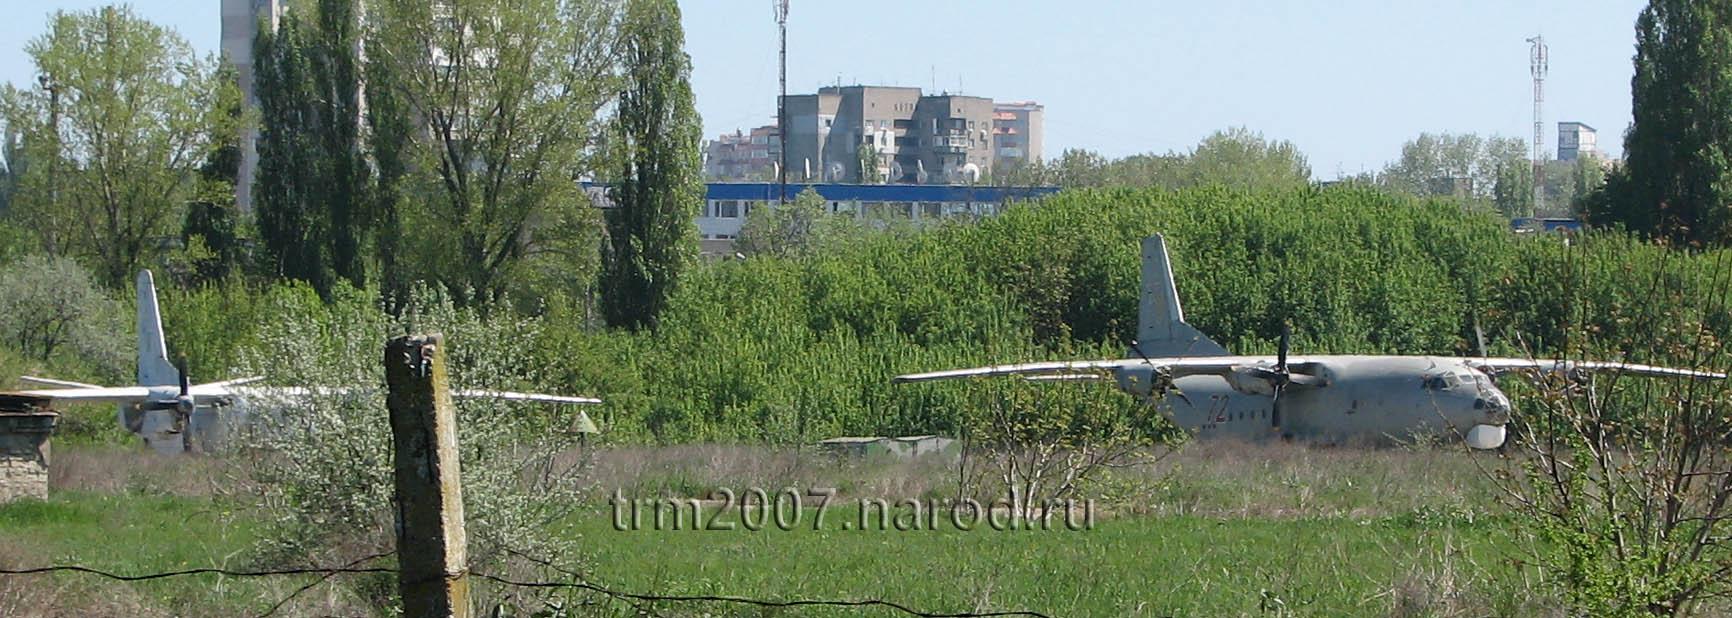 Транспортники АН-12 и АН-24